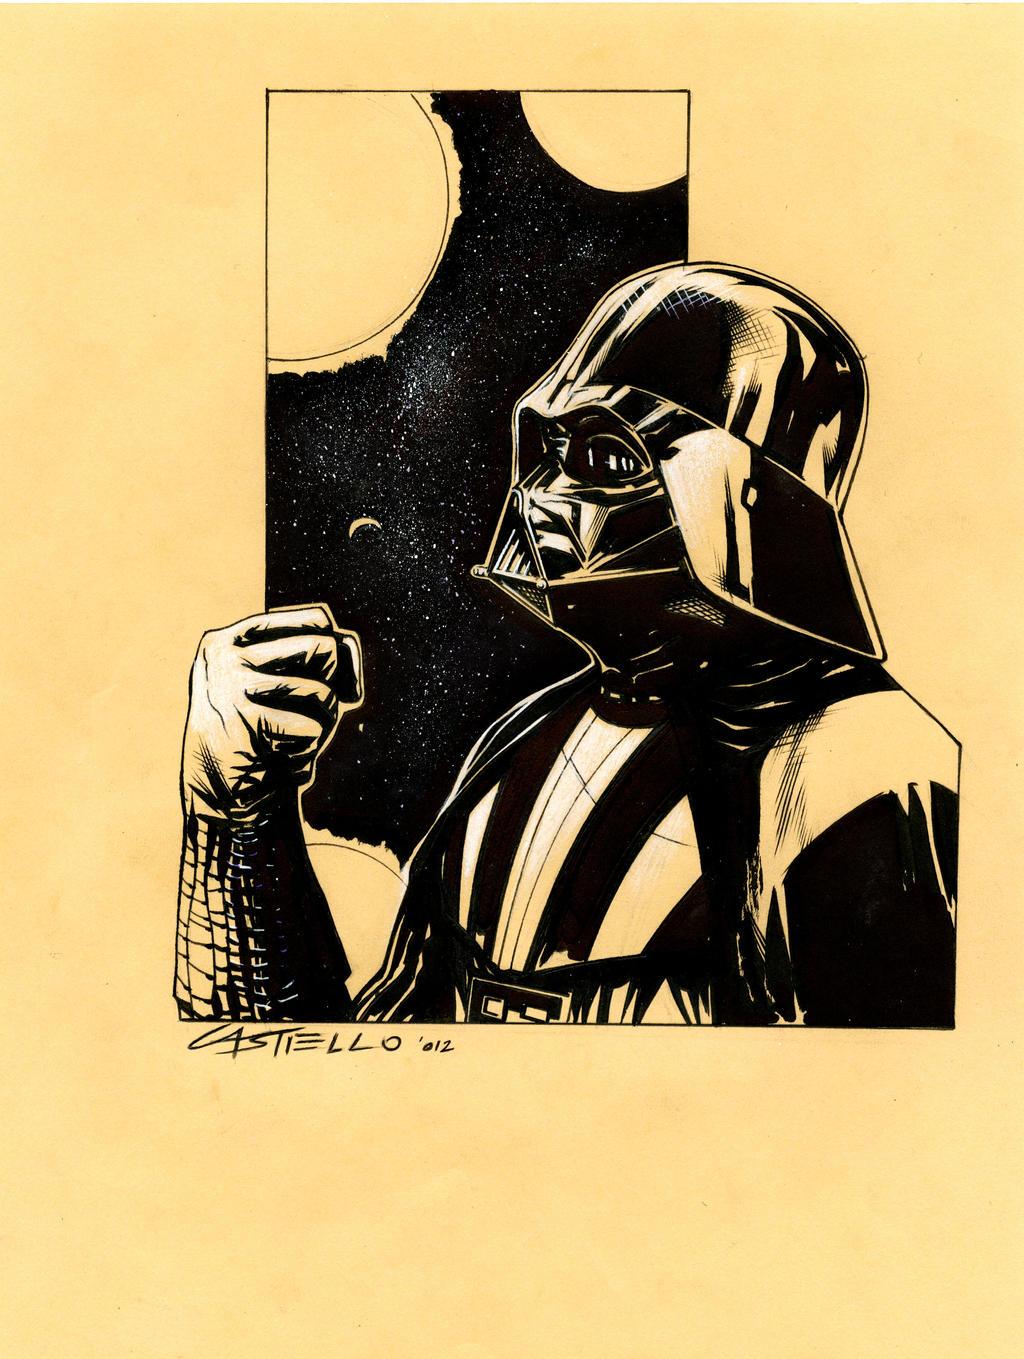 Darth Vader sketch by marcocastiello on DeviantArt